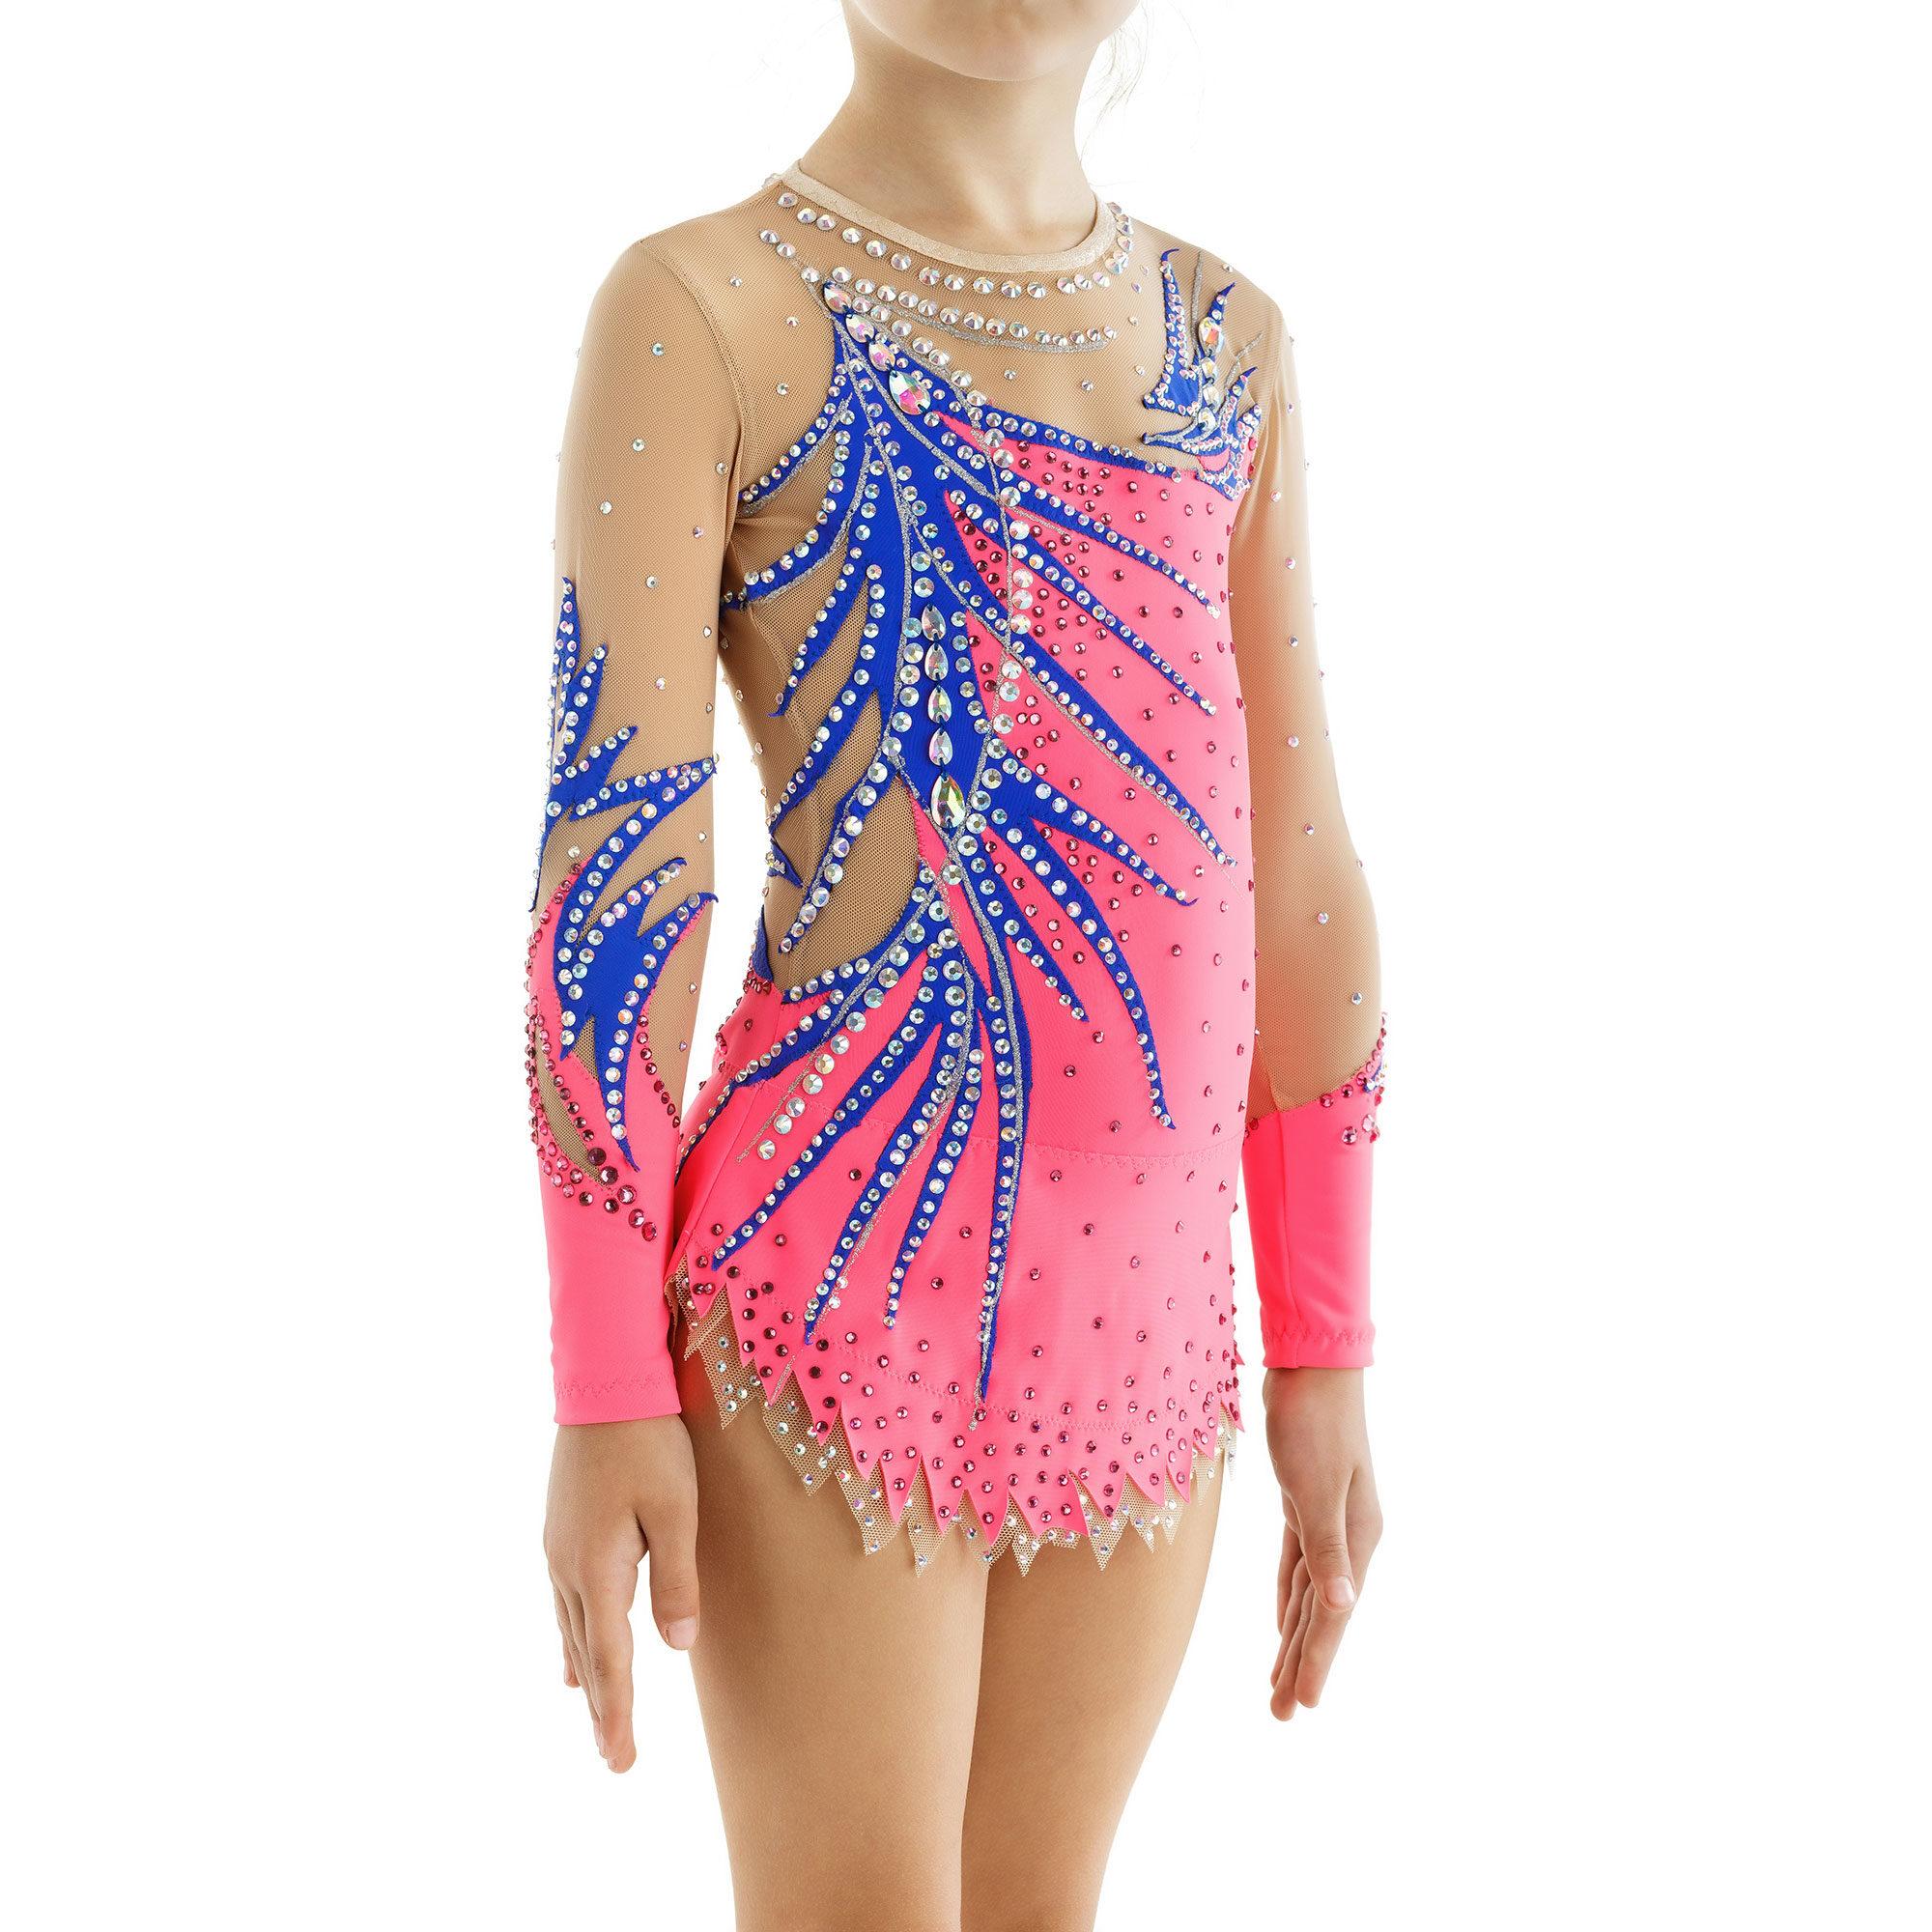 Rhythmic Gymnastics Leotard 202 in coral, blue & mesh colors